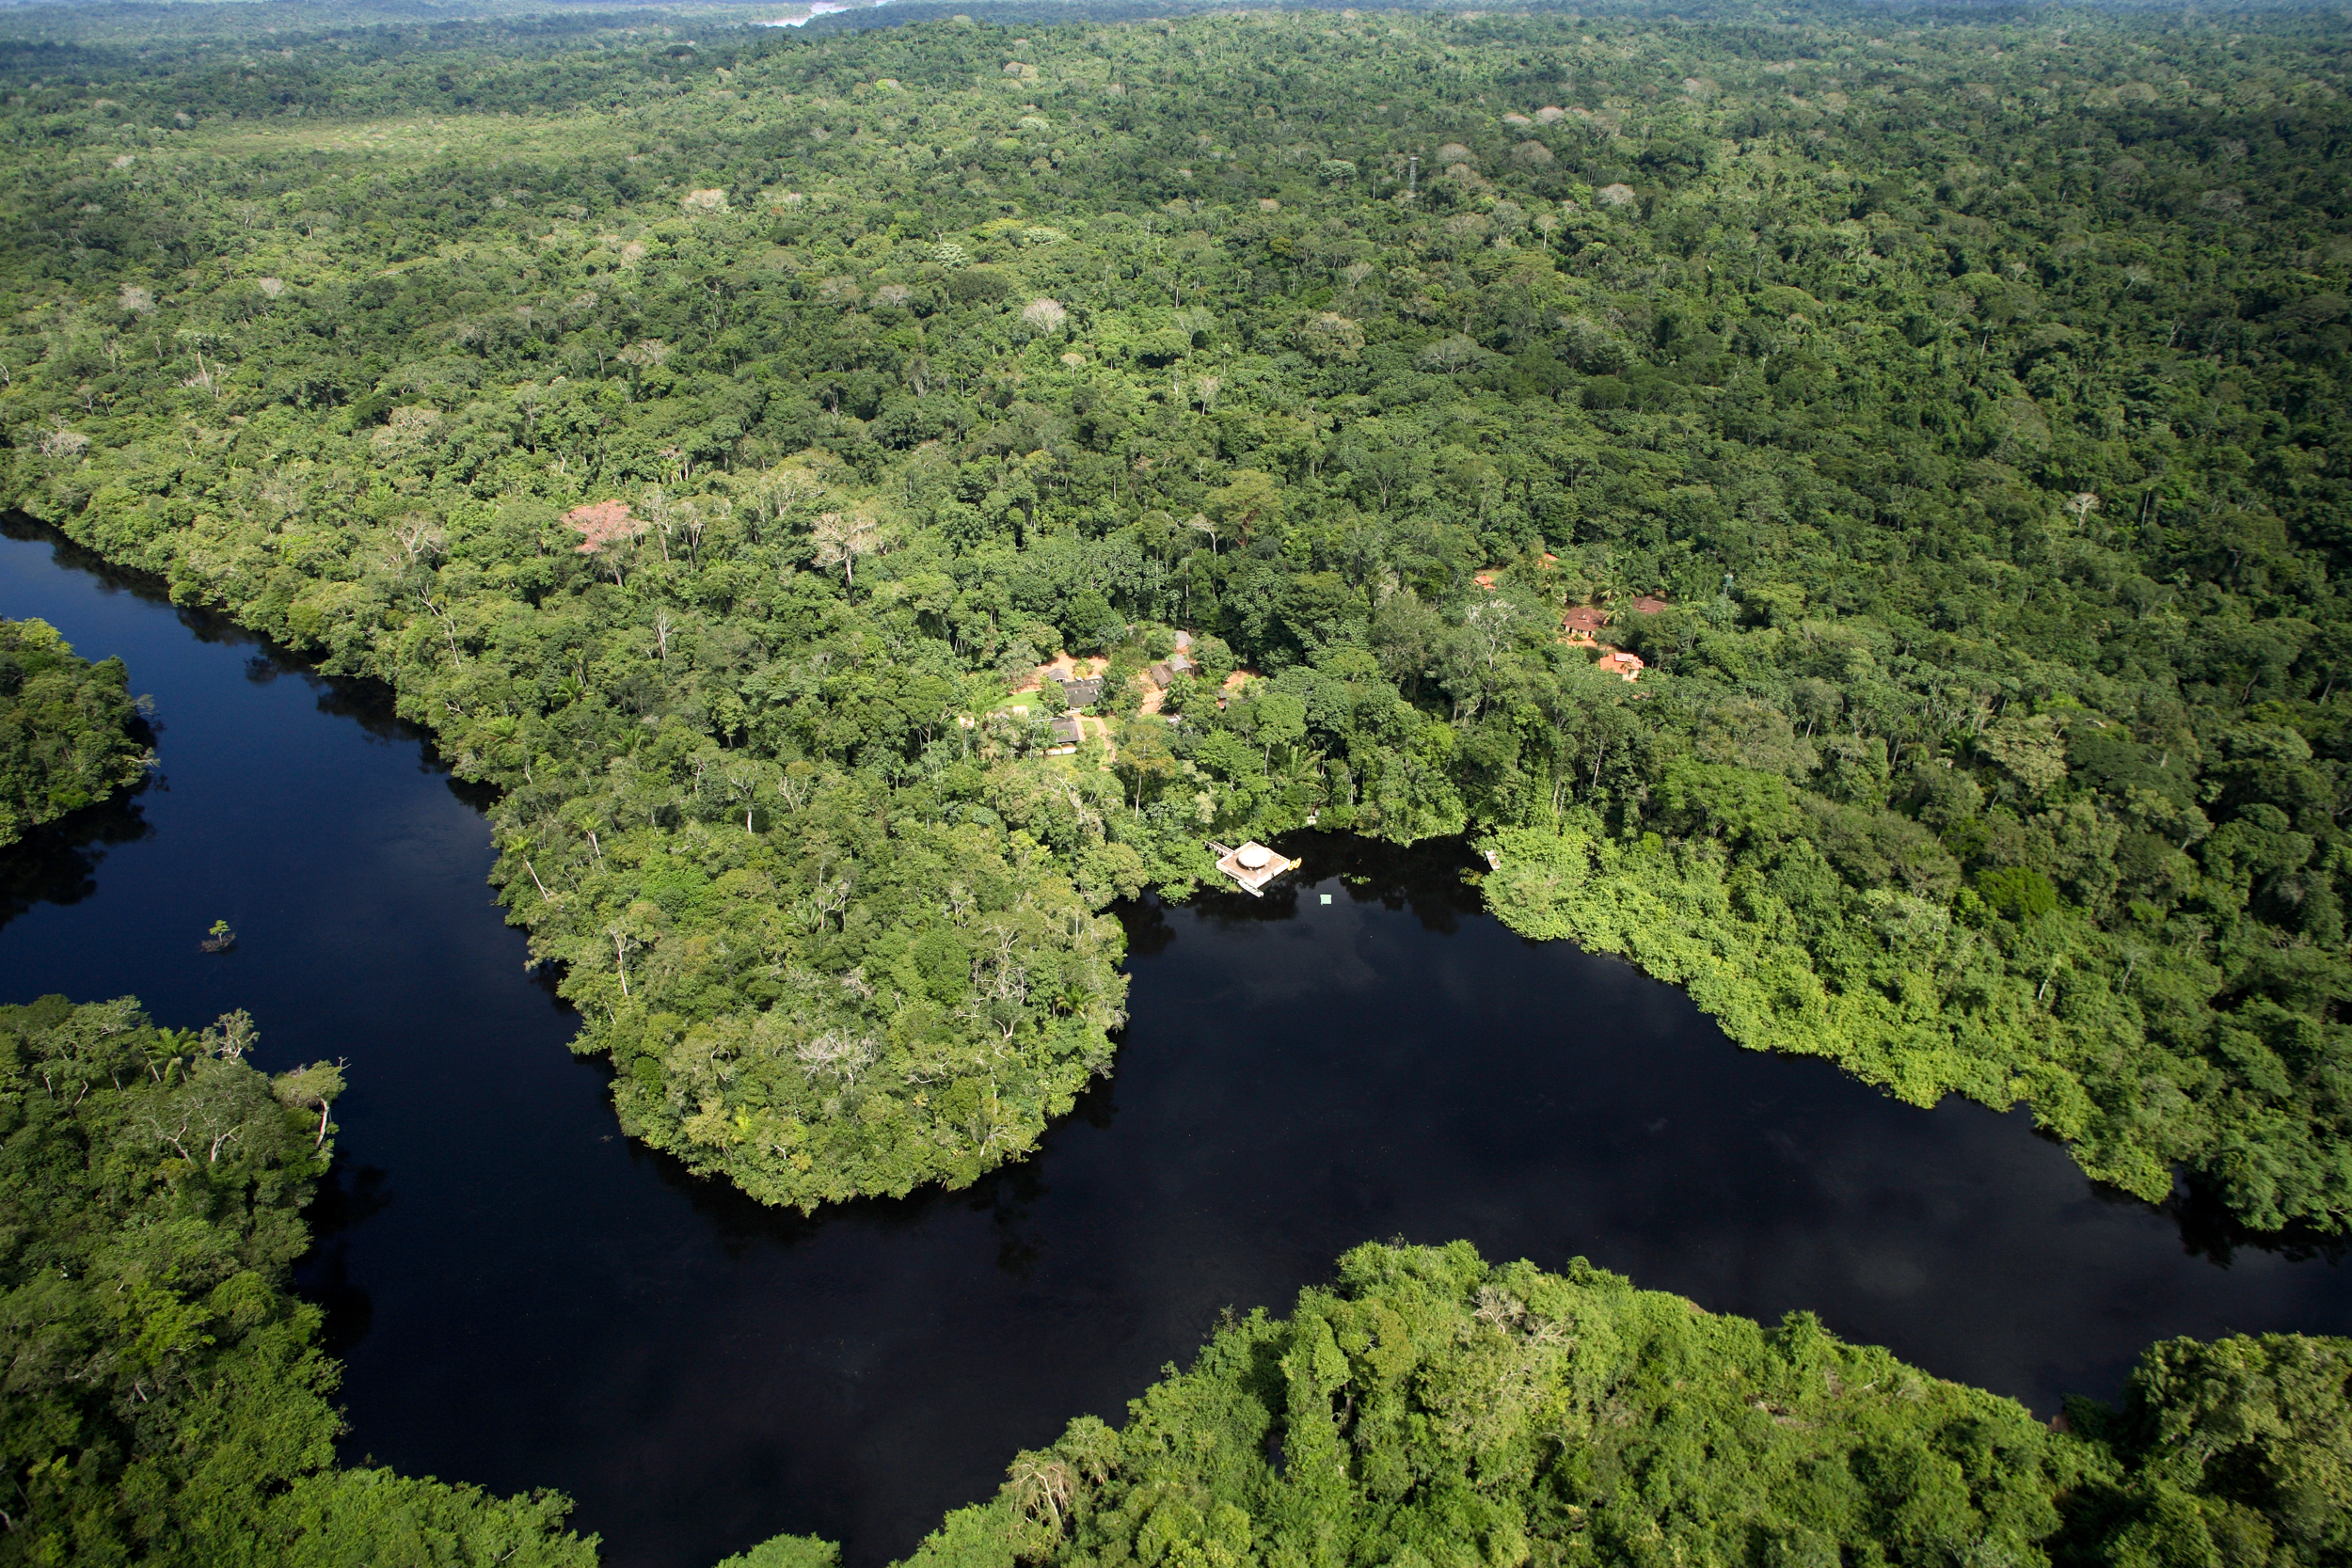 Image property of Cristalino Lodge